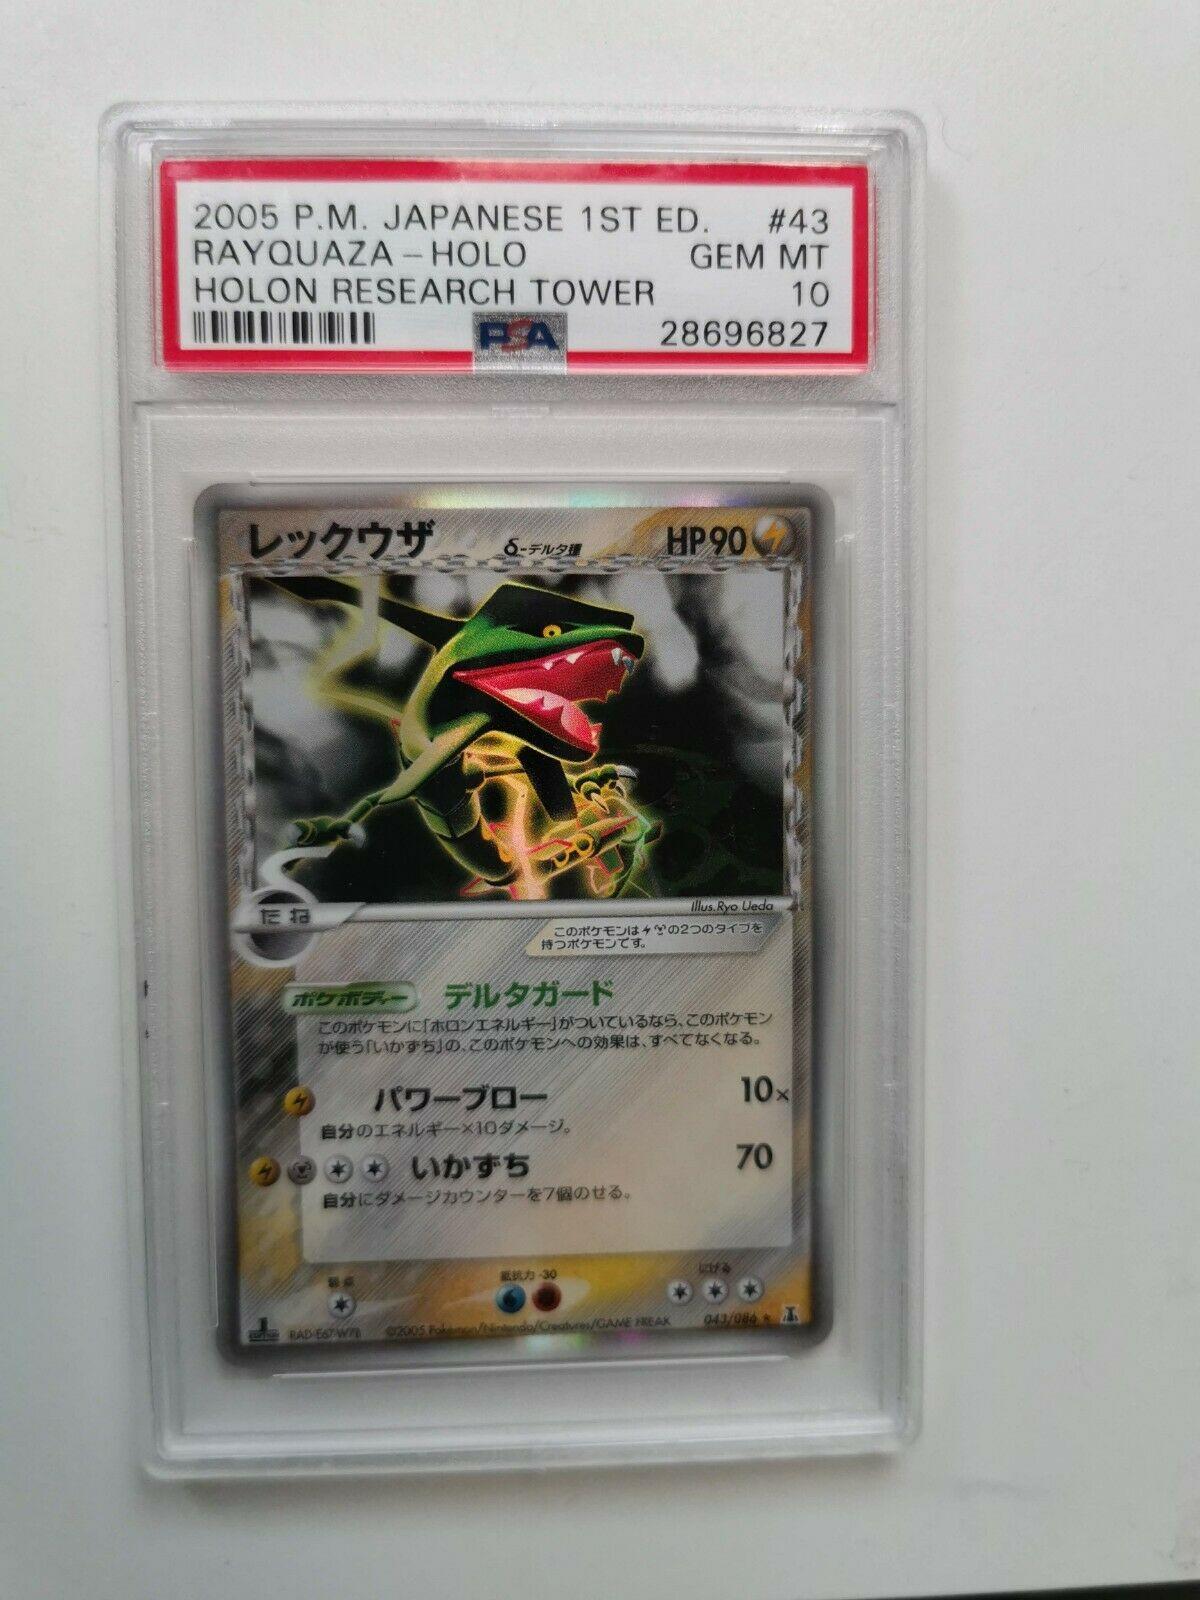 JAPANESE Pokemon card 2005 Rayquaza 043086 1st Edition HOLO PSA 10 GEM MINT